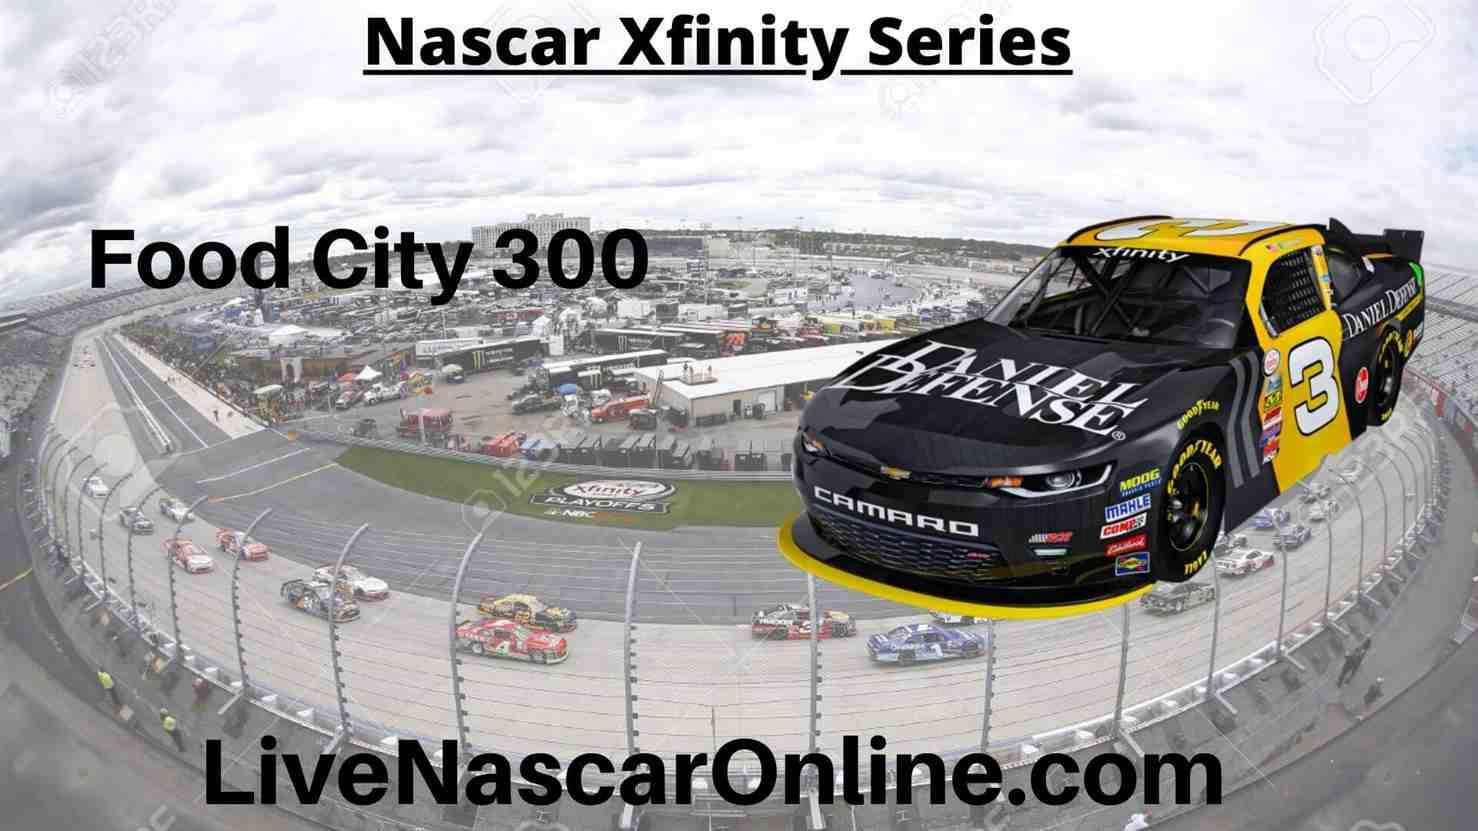 Food City 300 Online Stream | NASCAR Bristol 2020